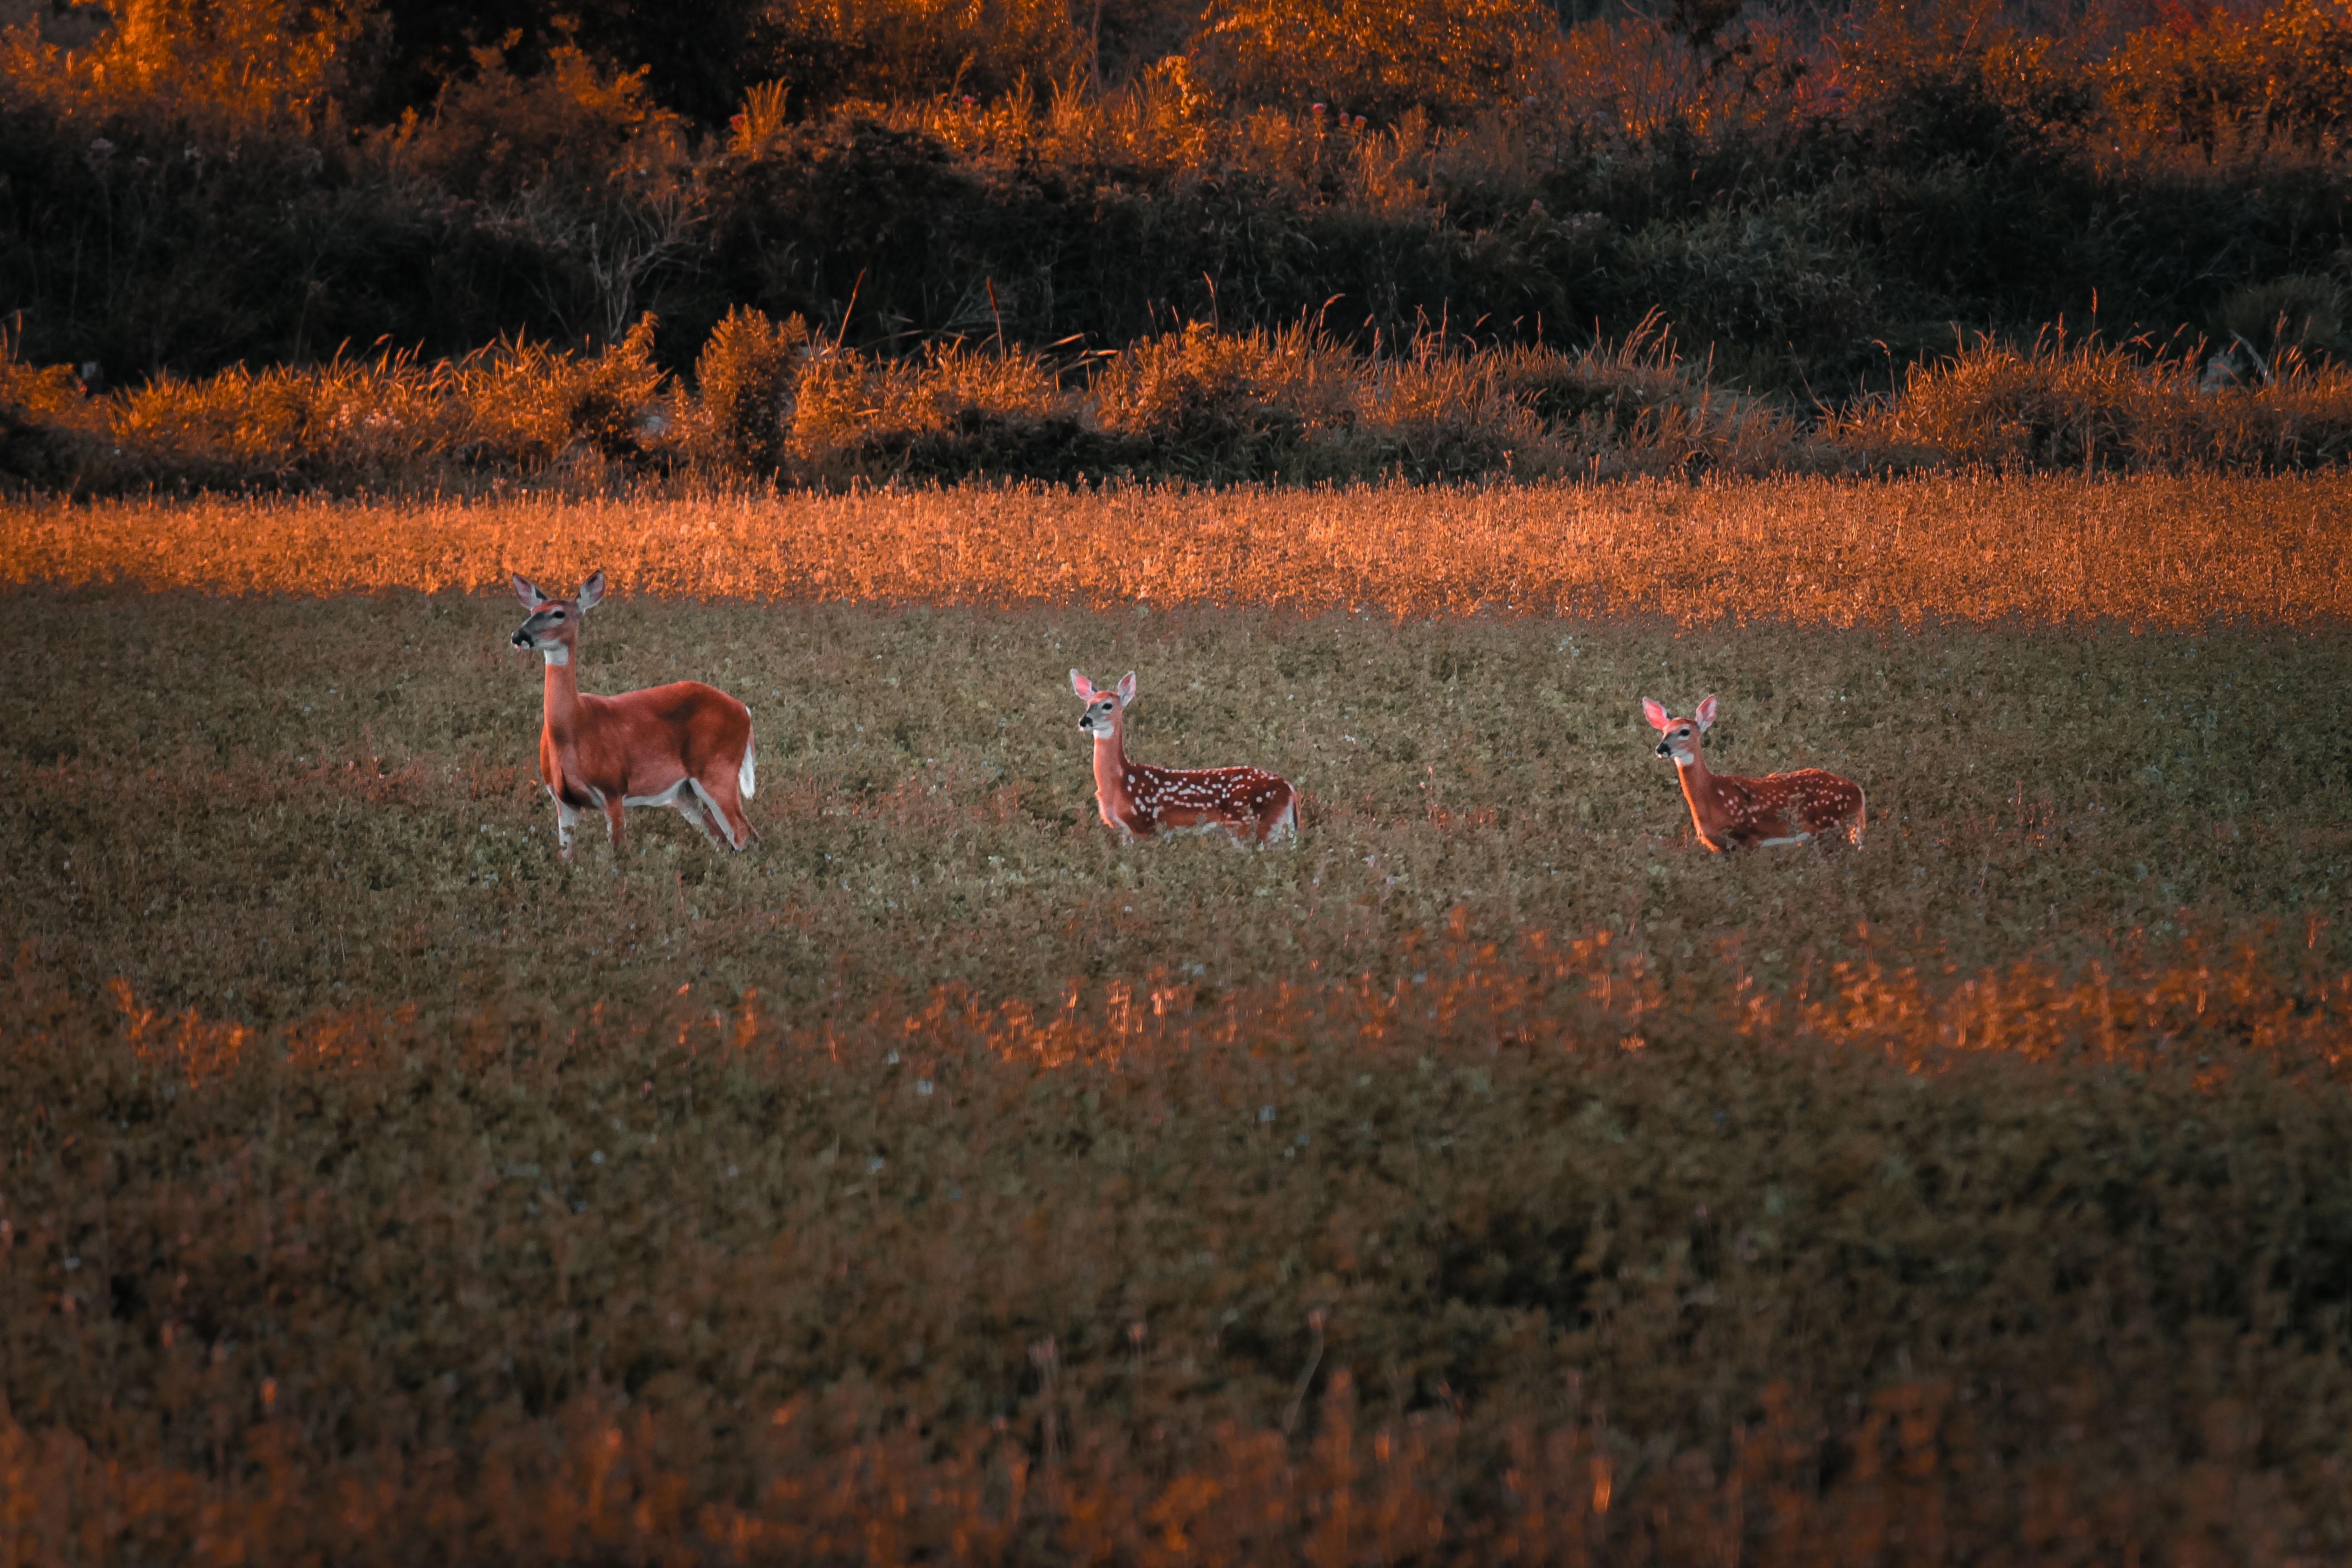 three deers on grass